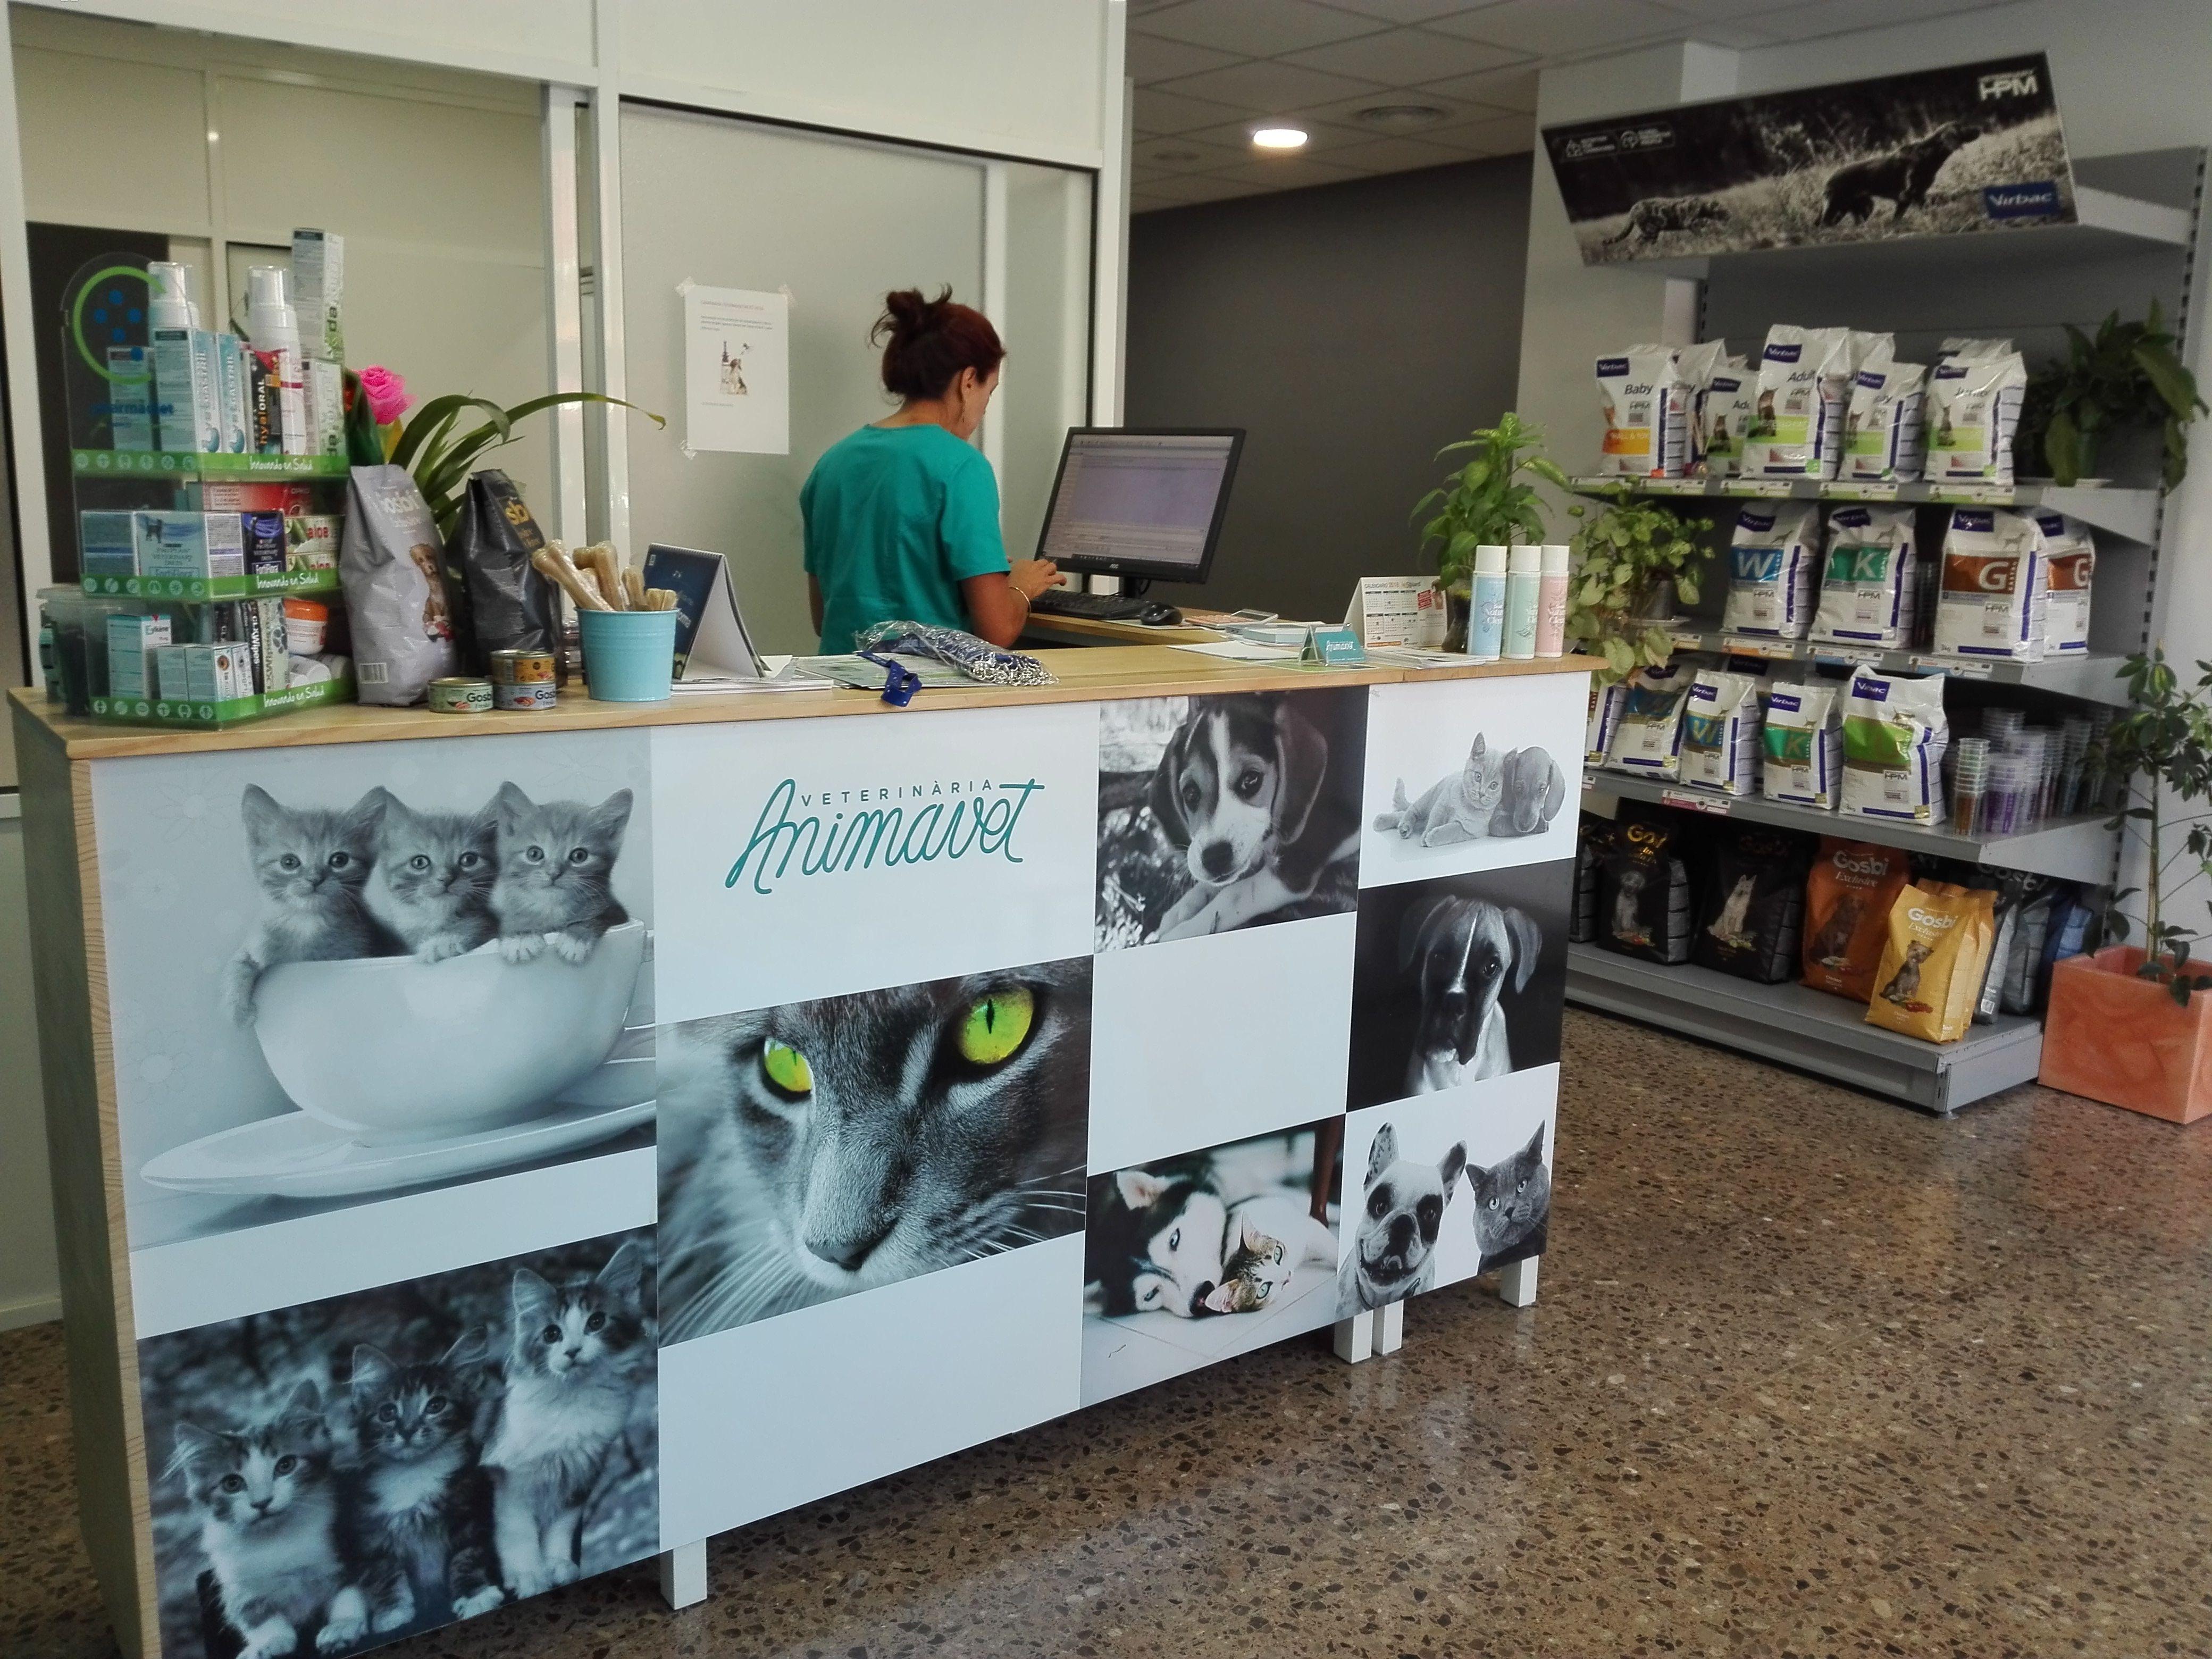 Foto 3 de Veterinarios en Sant Sadurní d'Anoia | Veterinaria Animavet